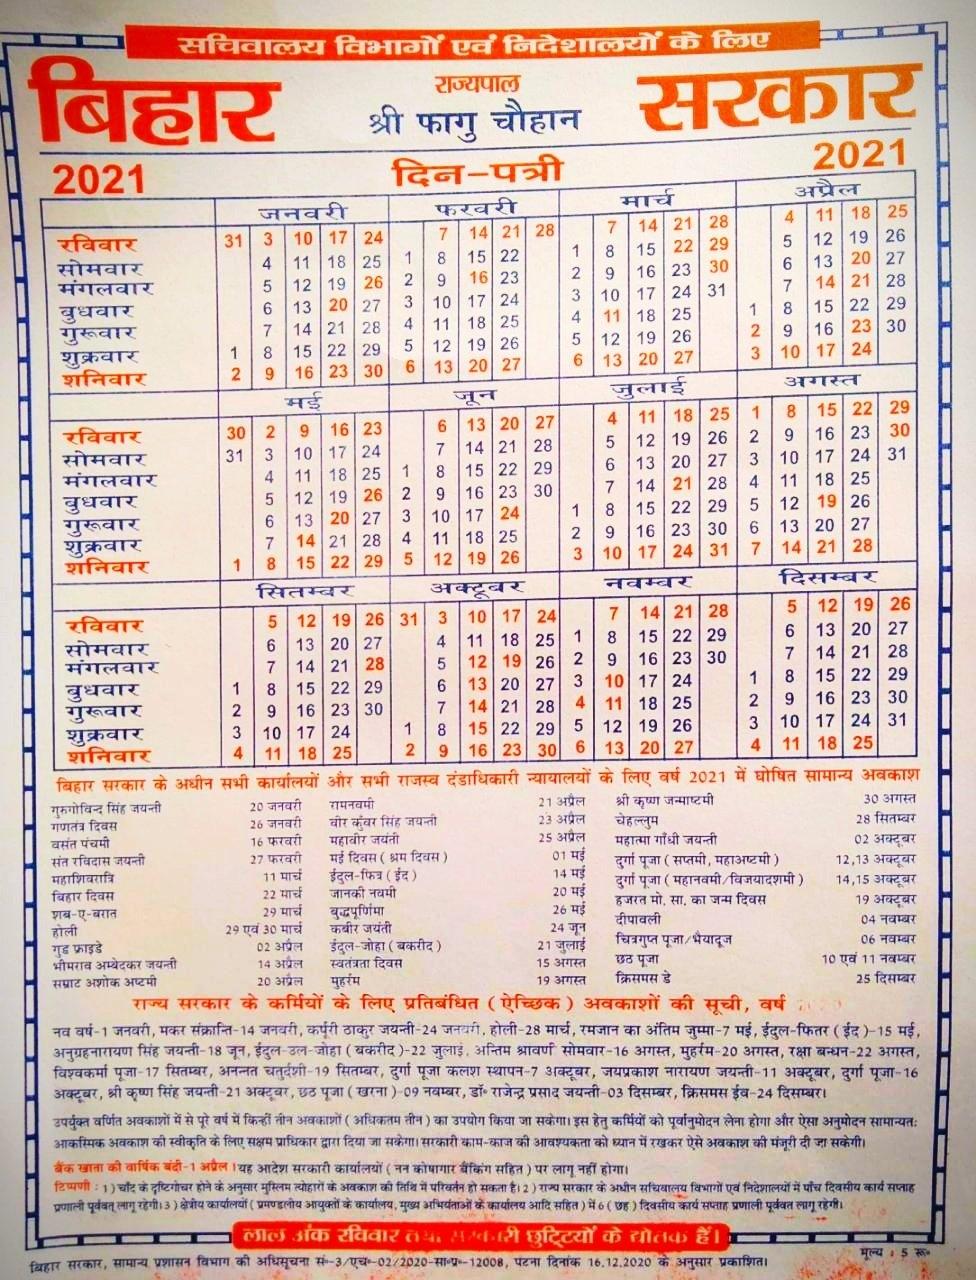 Bihar Government Calendar 2021 - Speakdoor inside Bangladesh 2021 Government Calendar